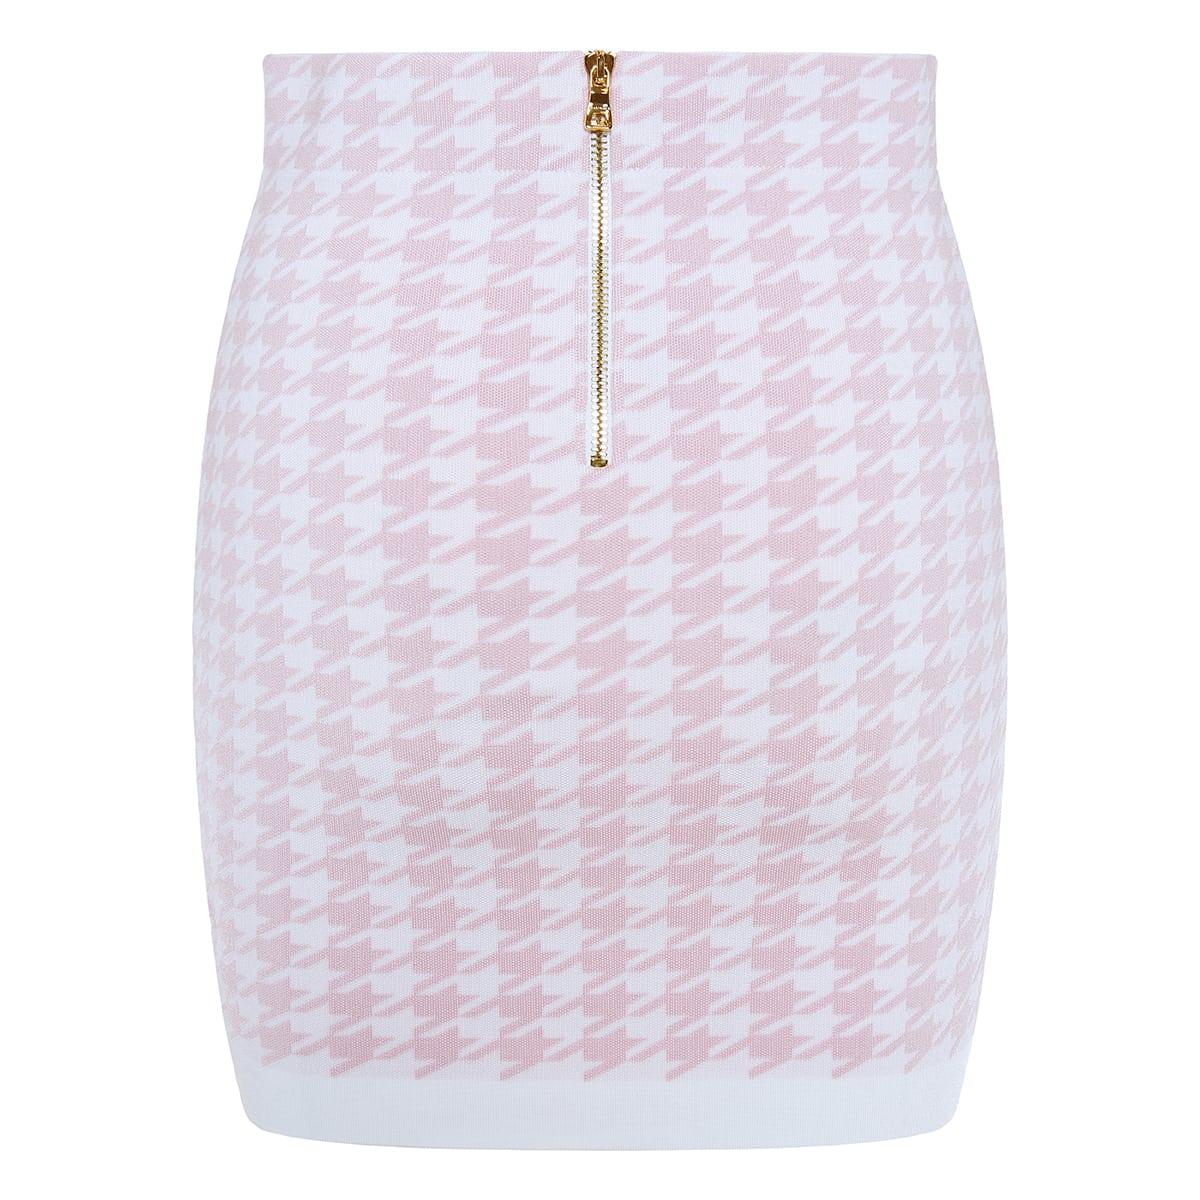 Houndstooth knitted mini skirt